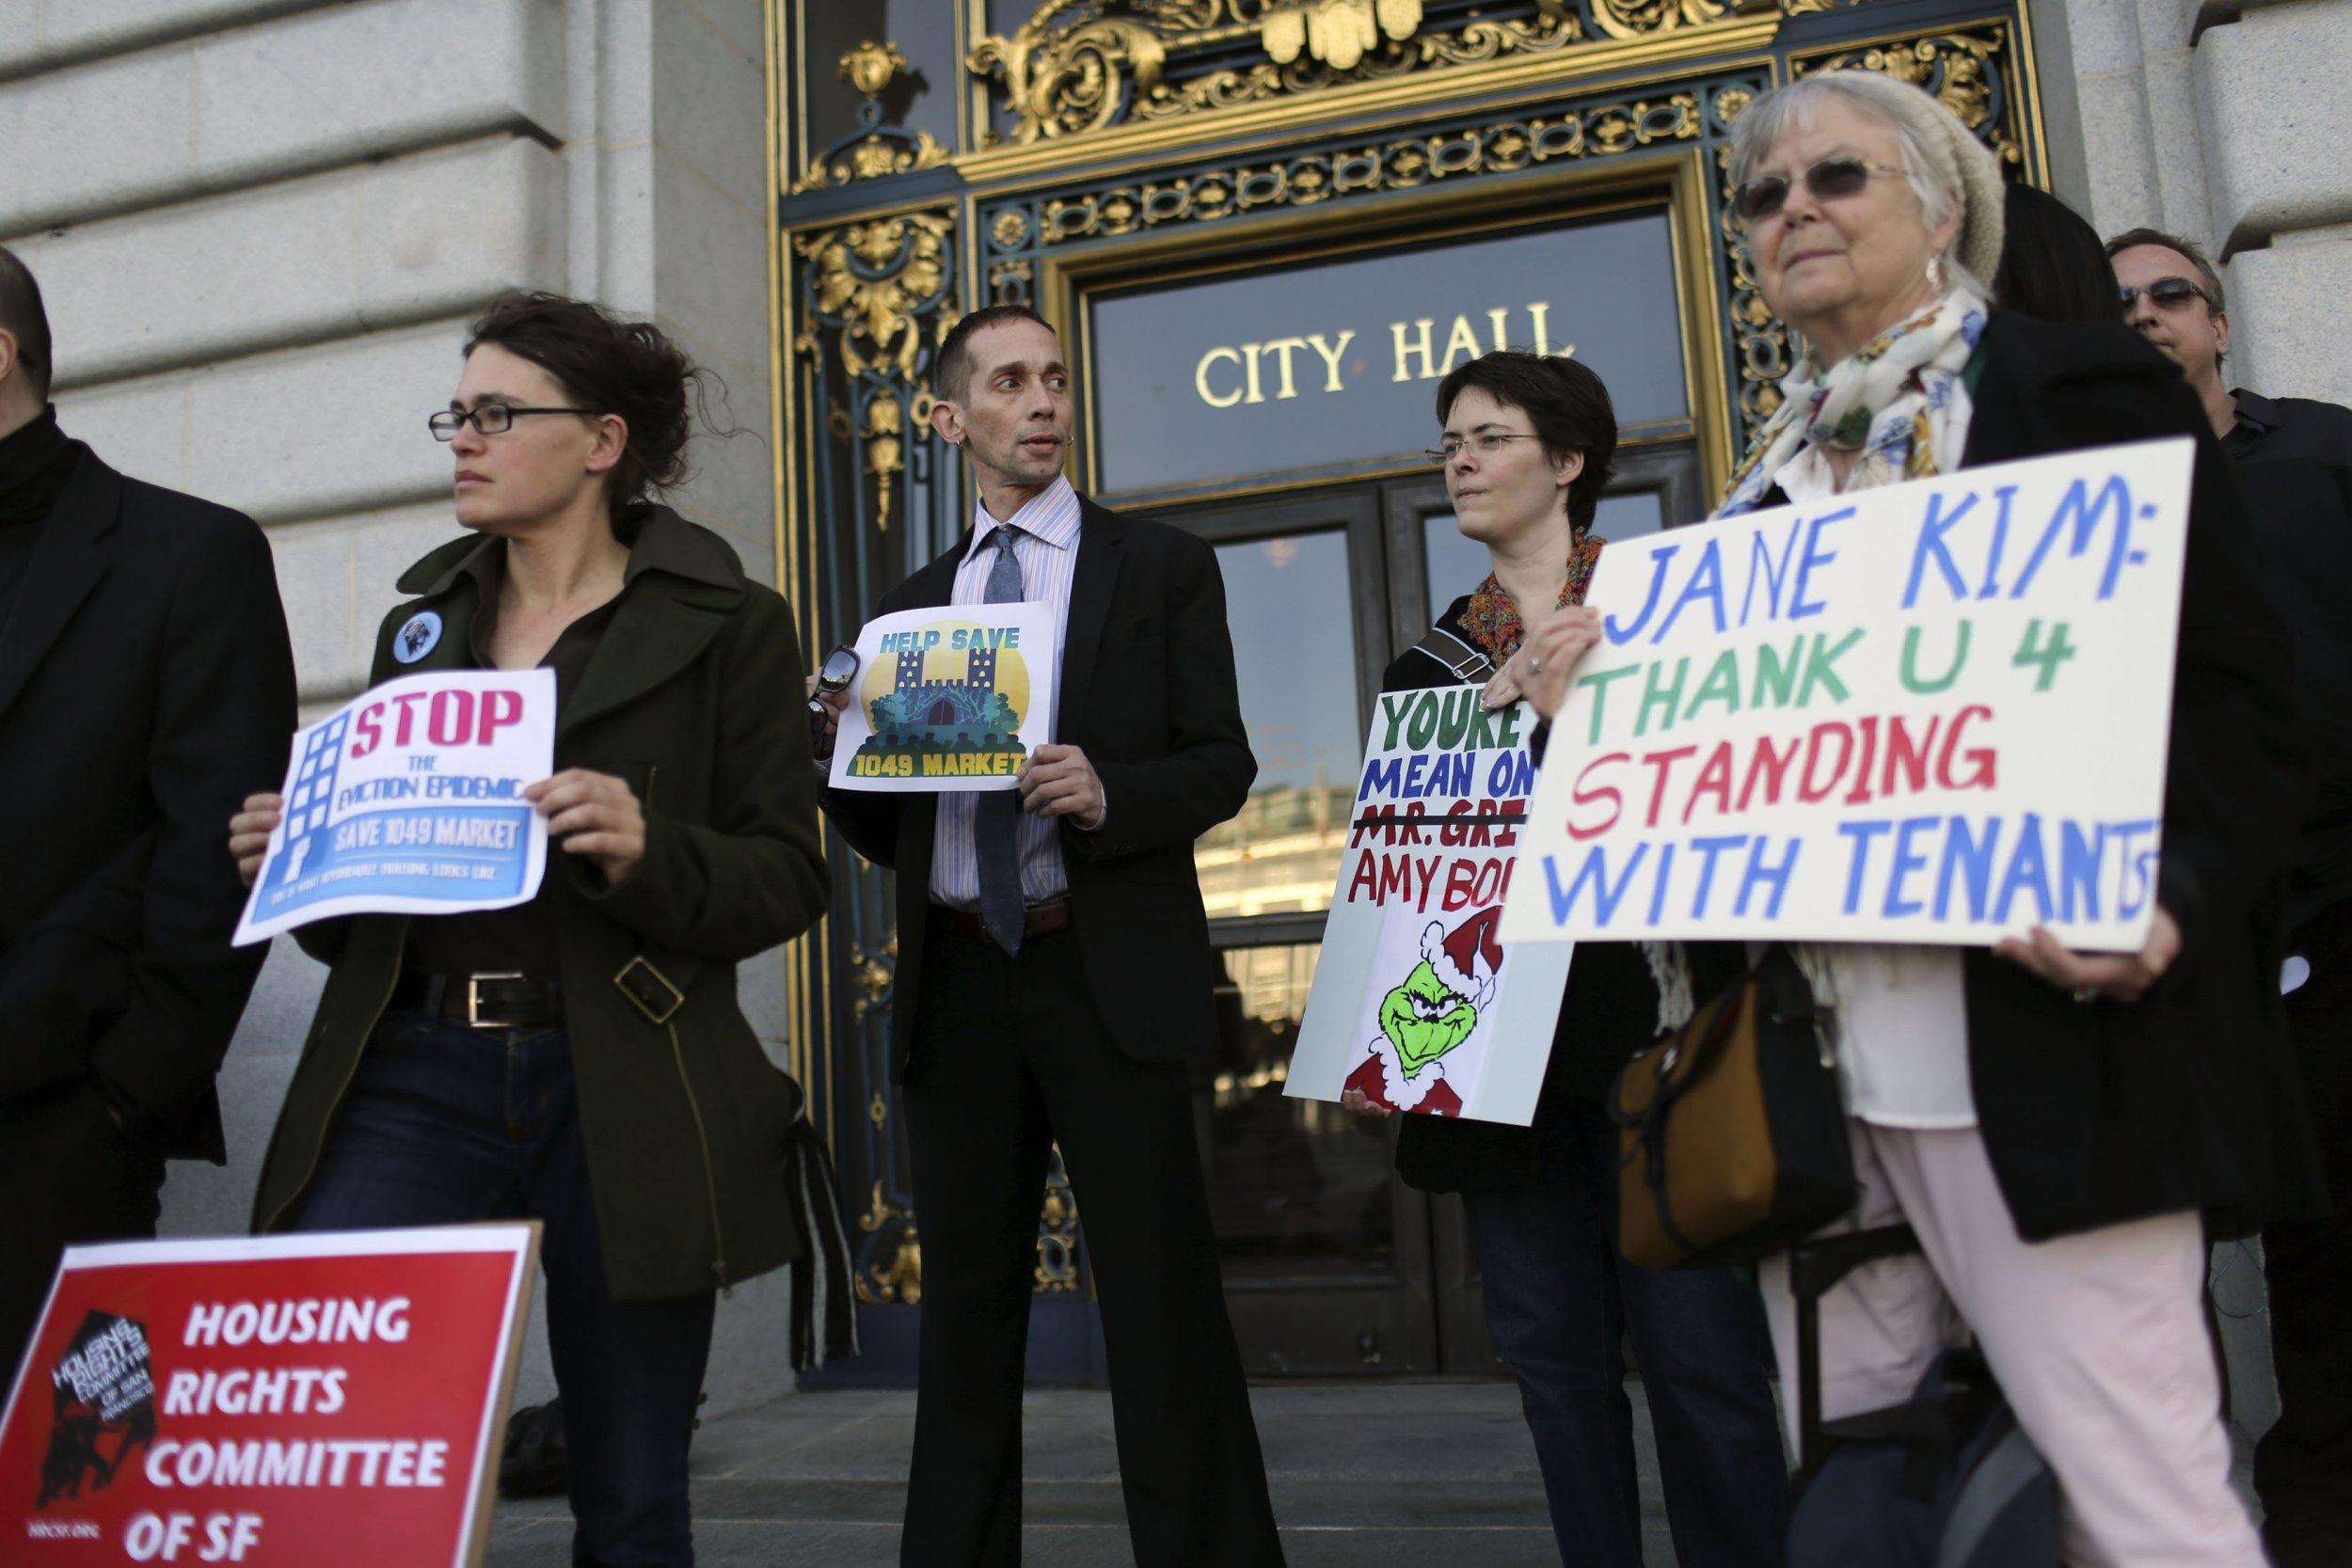 Protesters in SF